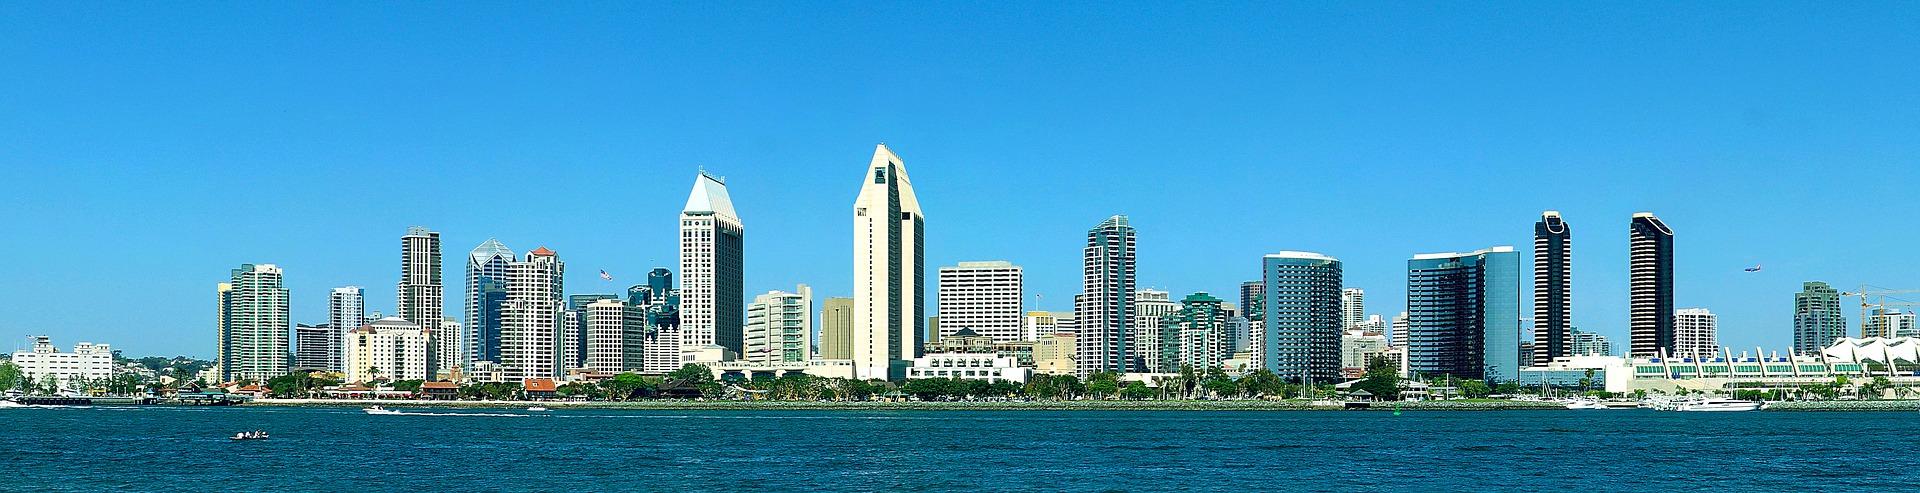 San Diego surpasses Los Angeles in home unaffordability